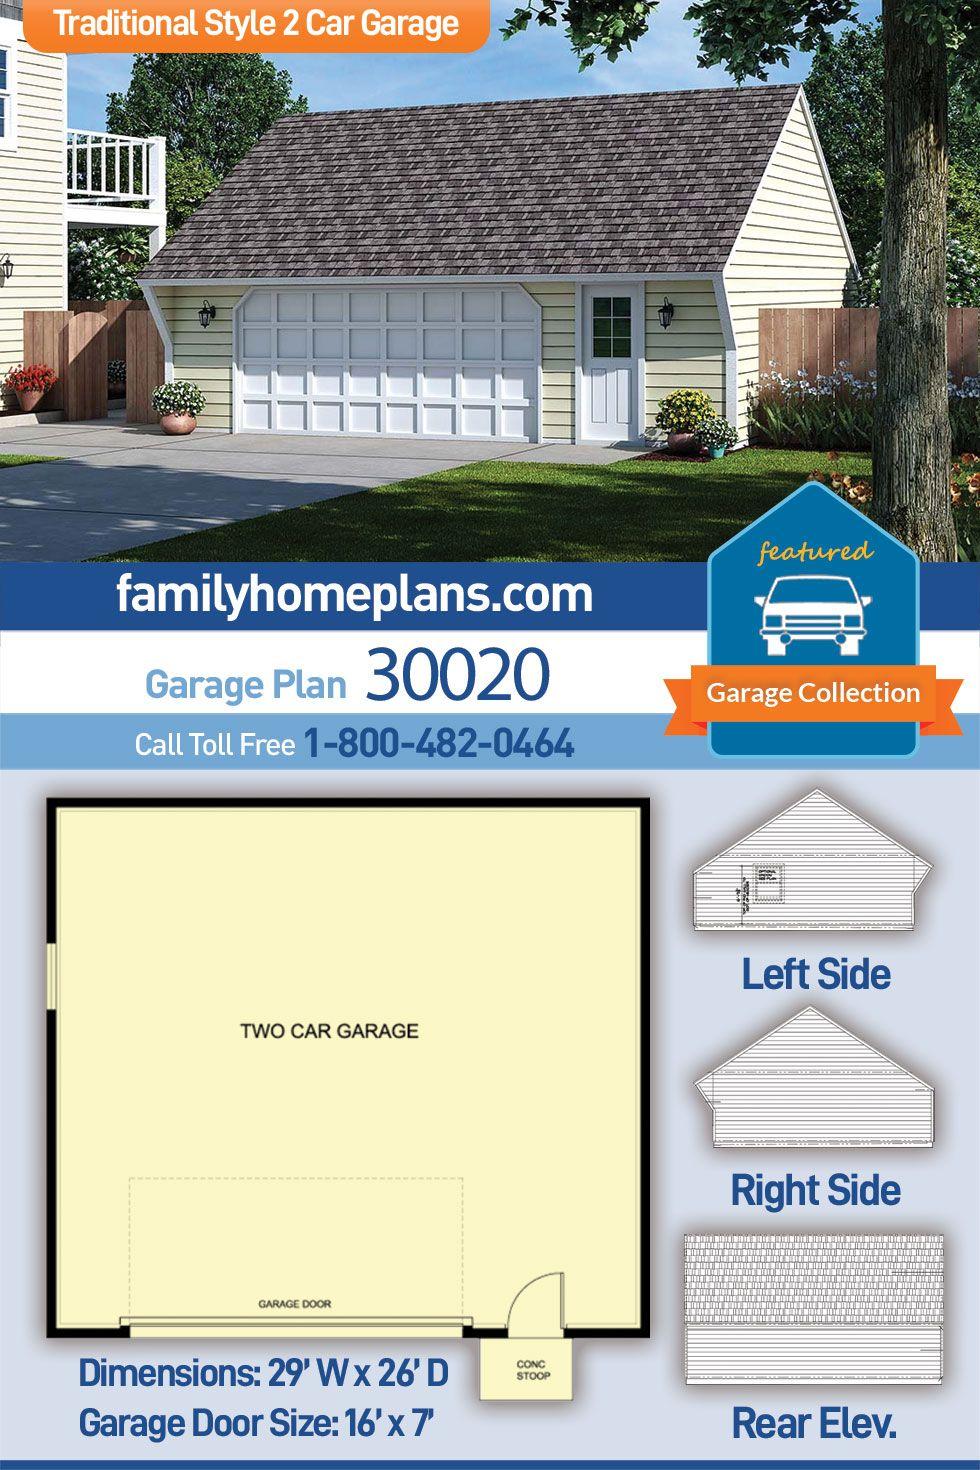 Traditional Style 2 Car Garage Plan Number 30020 Garage Plan Garage Building Plans Garage Door Dimensions